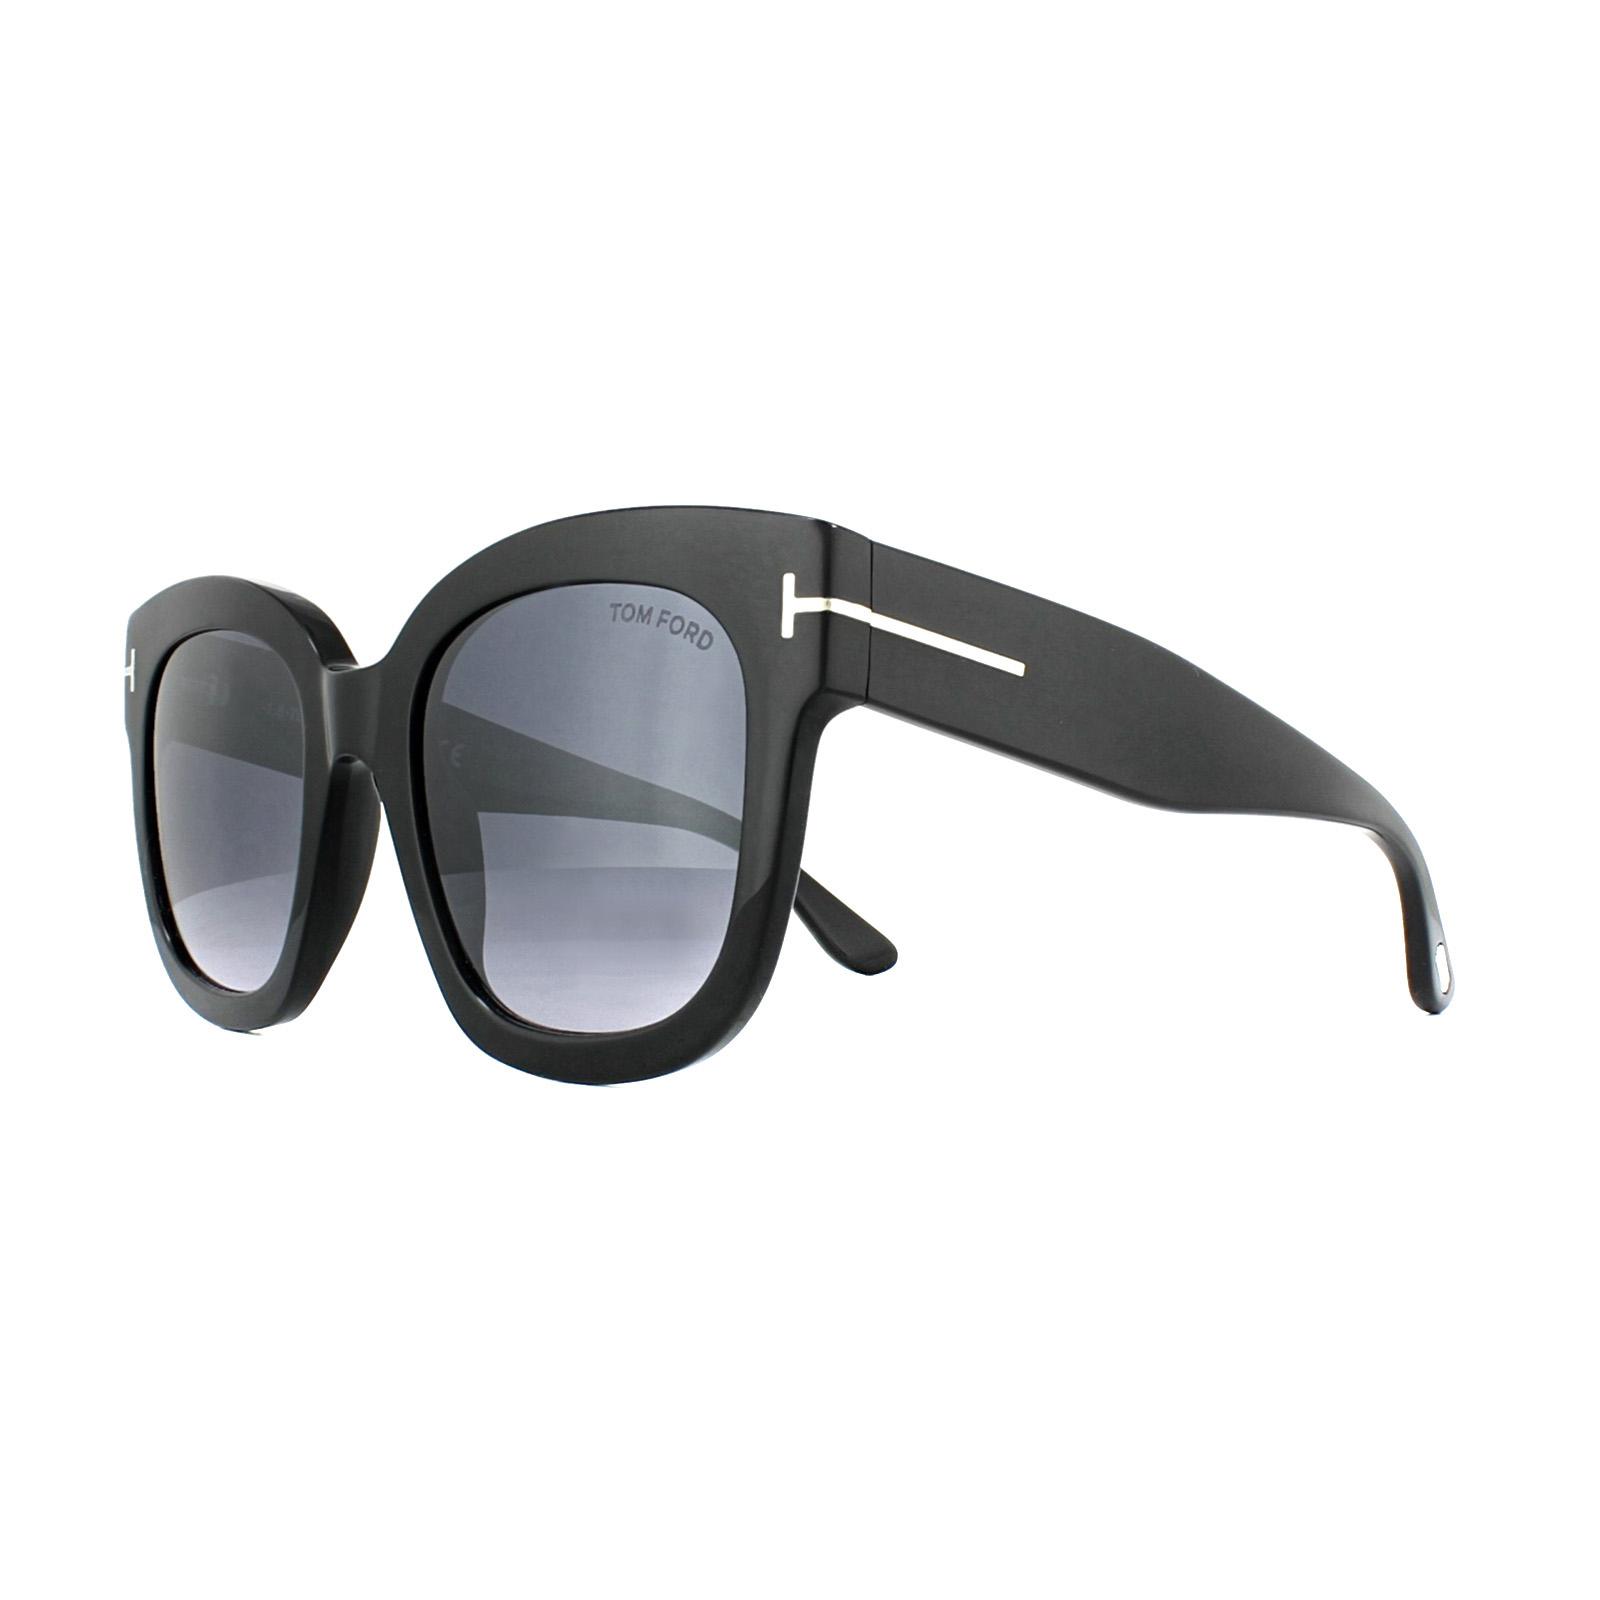 50ddb35033 Sentinel Tom Ford Sunglasses 0613 Beatrix 01C Shiny Black Smoke Grey Mirror